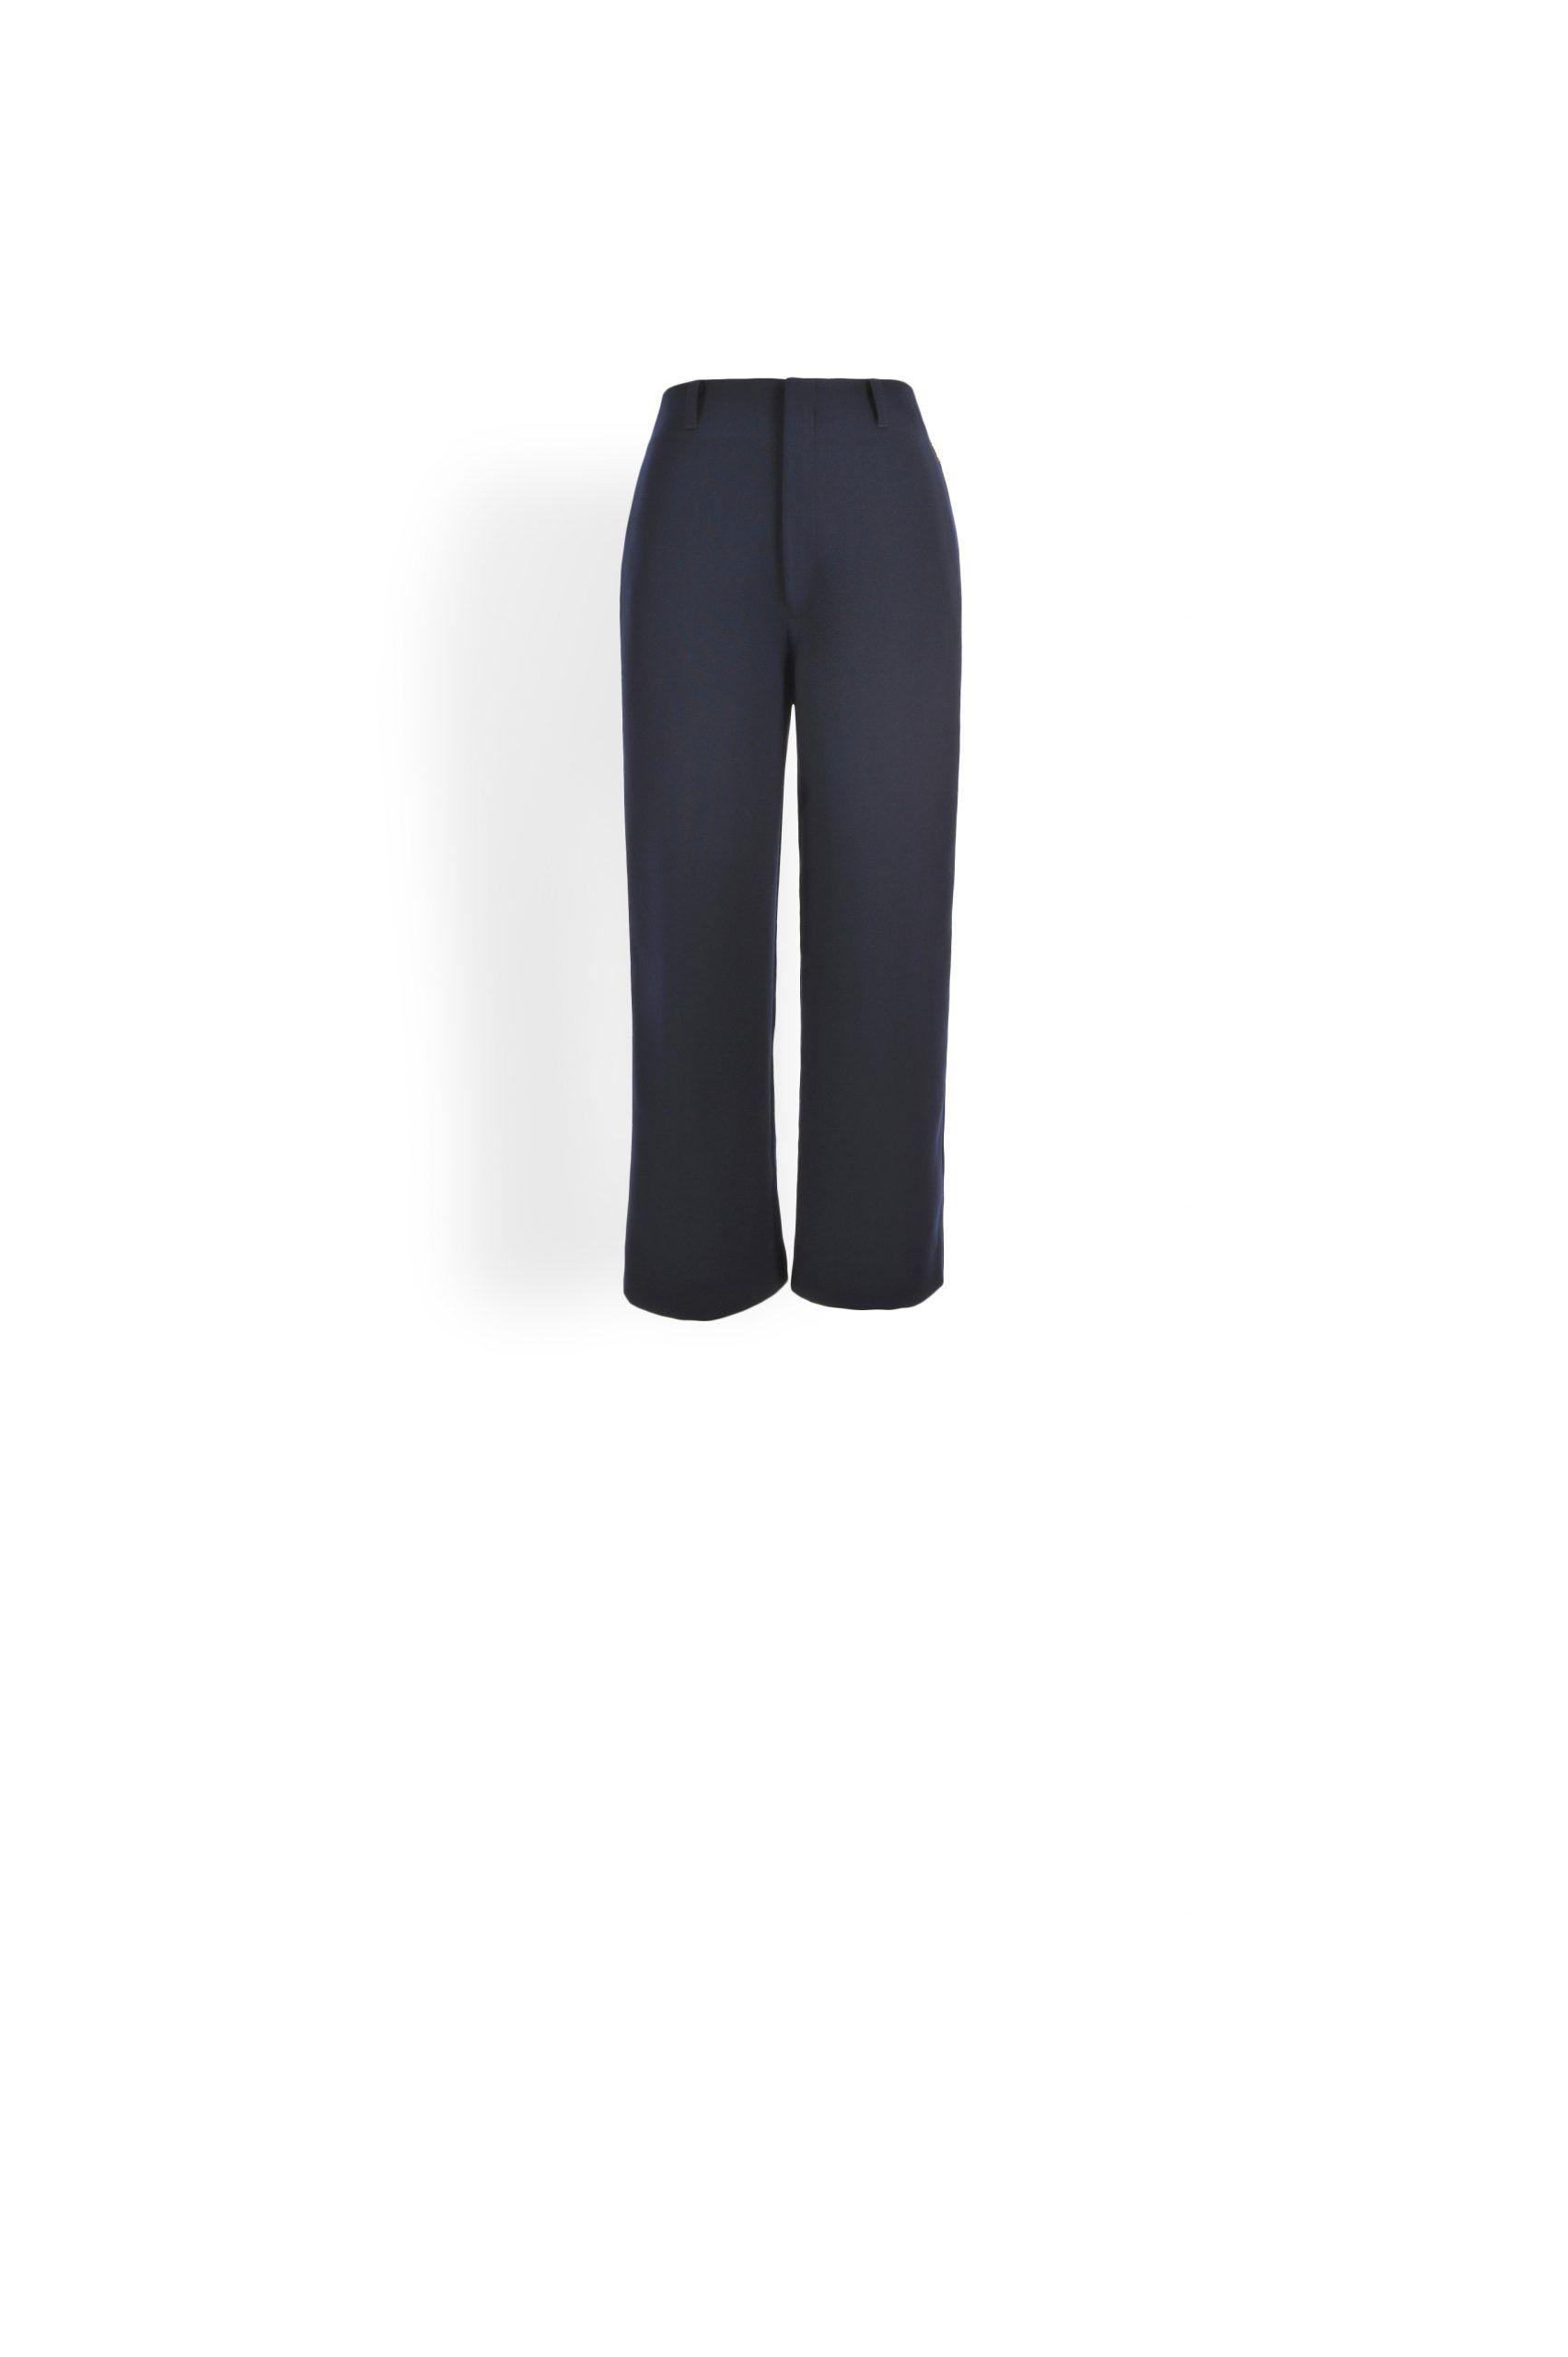 Phoenix V trousers occasion wear